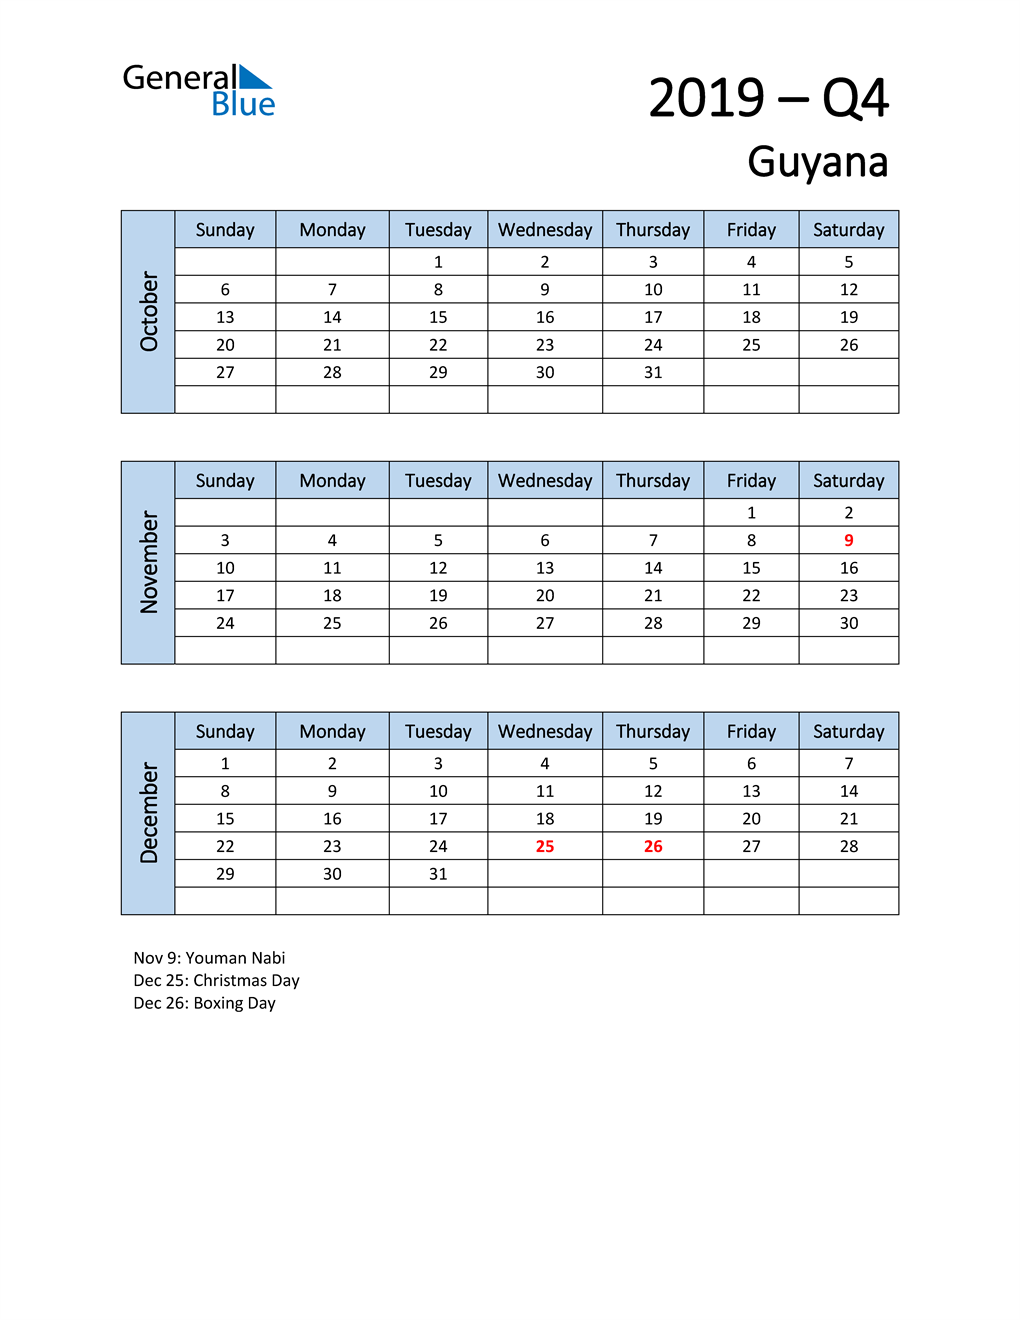 Free Q4 2019 Calendar for Guyana